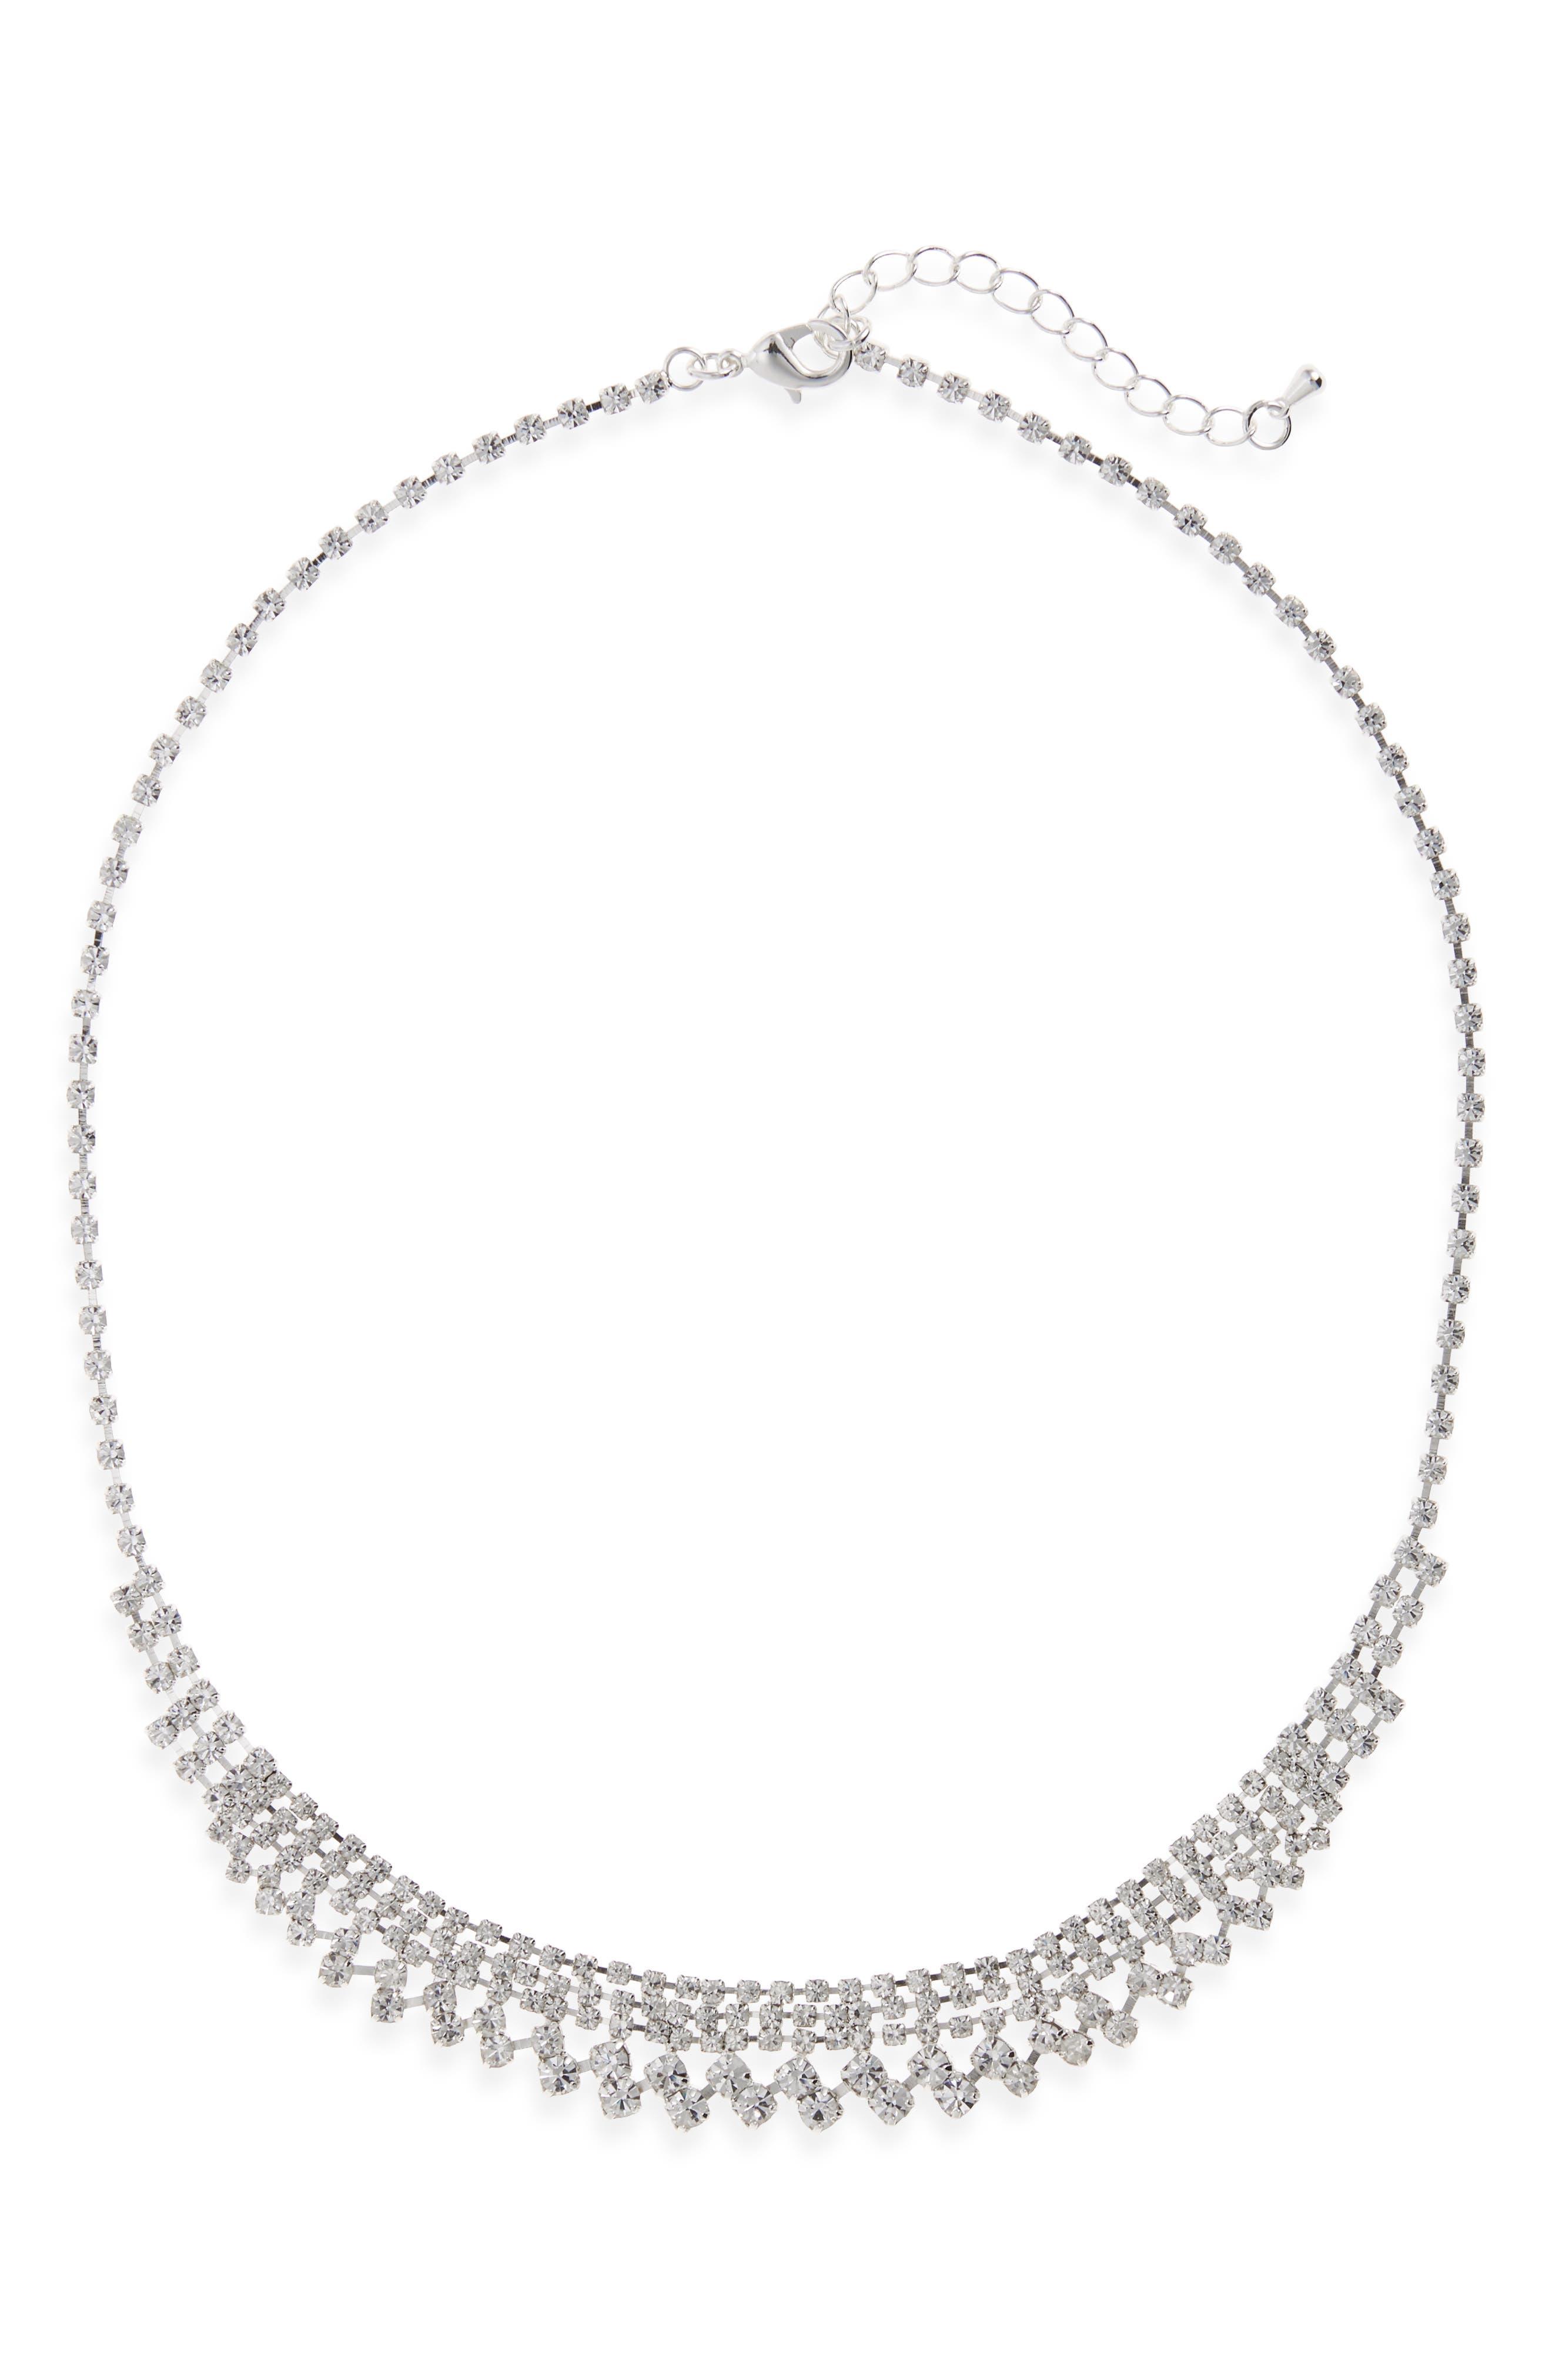 Main Image - Nina Crystal Frontal Necklace